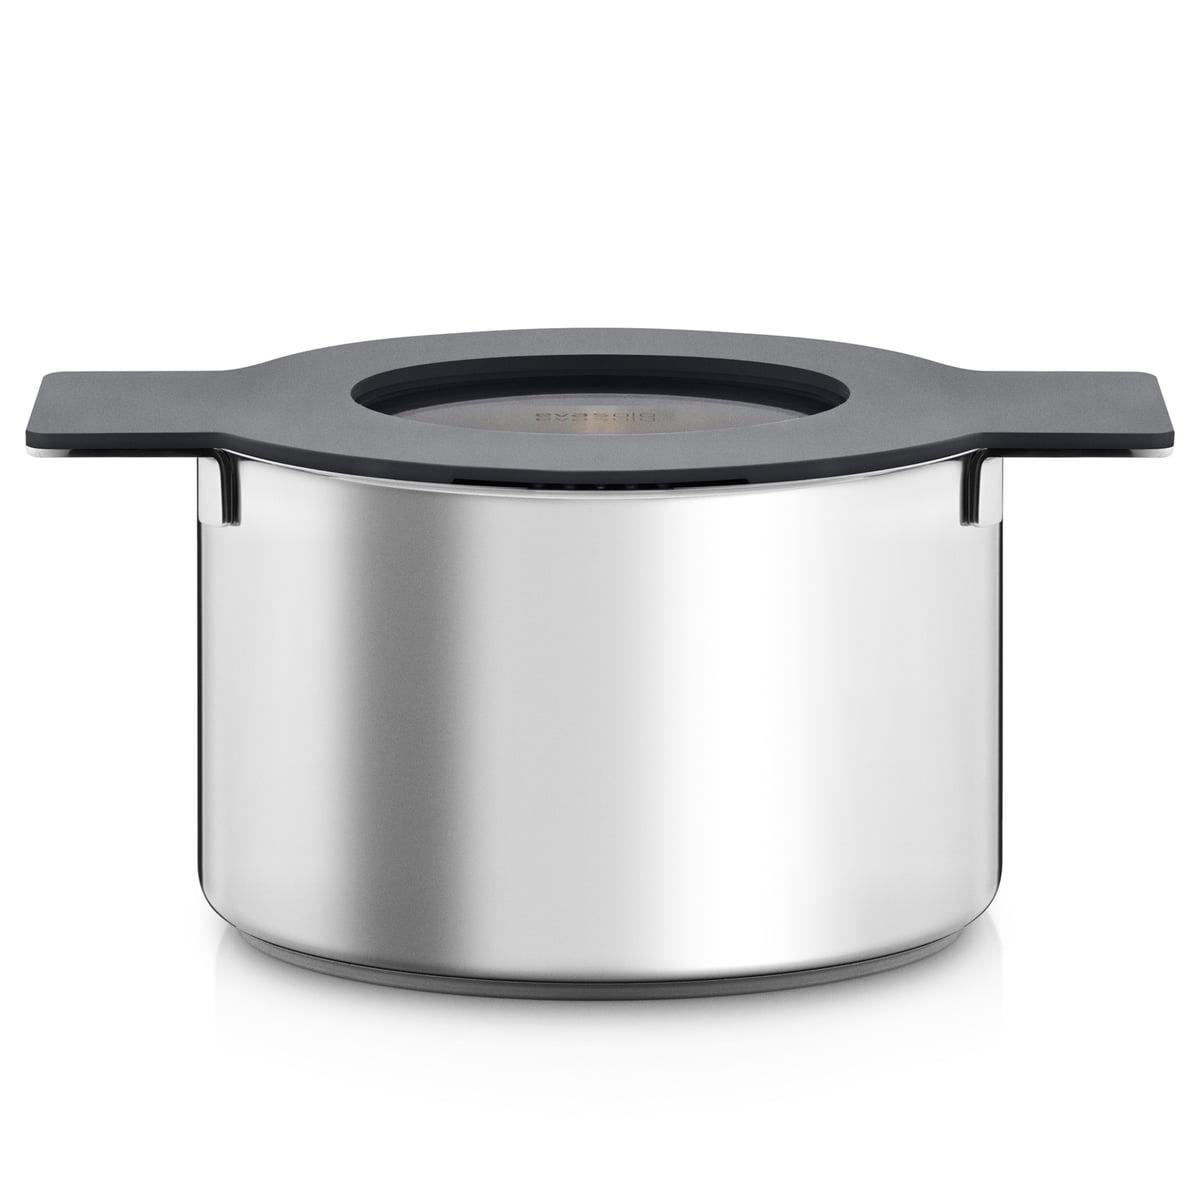 eva solo gravity pot in the home design shop. Black Bedroom Furniture Sets. Home Design Ideas